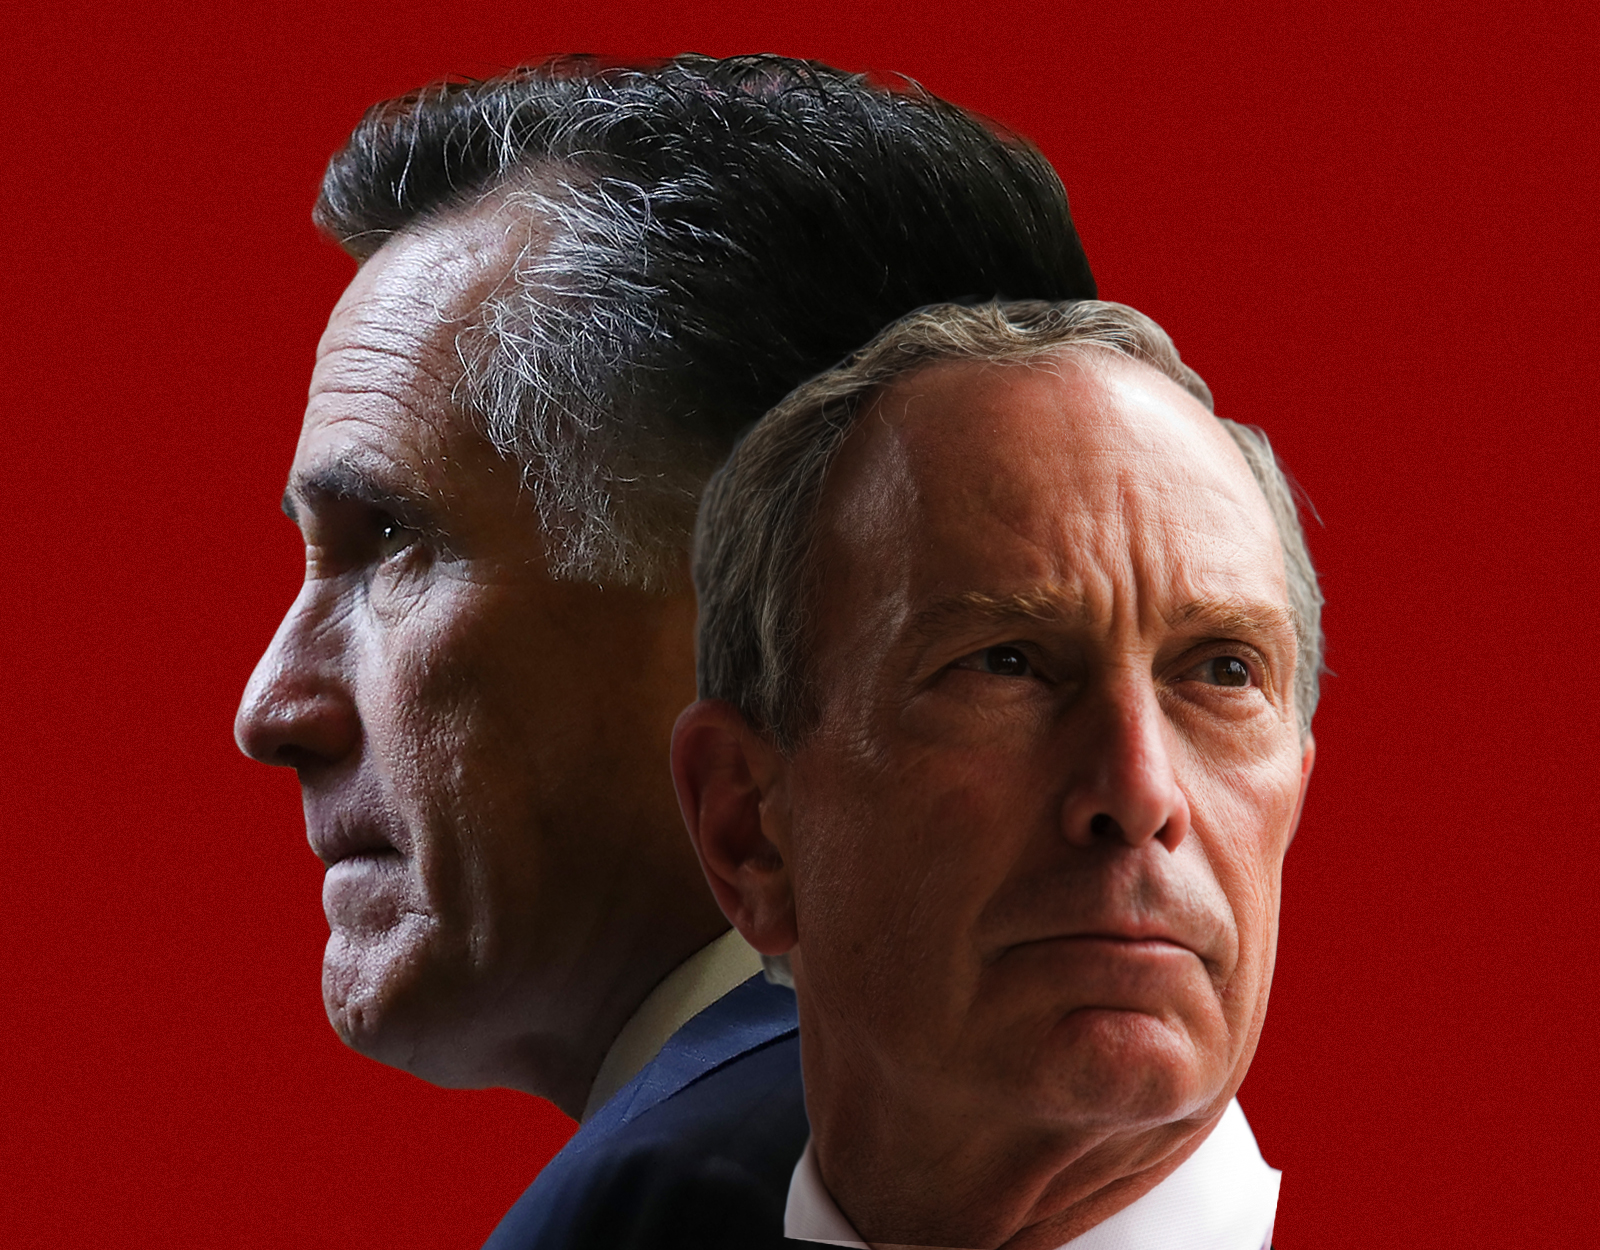 Romney-Bloomberg: The Unity Ticket America Deserves - The Bulwark